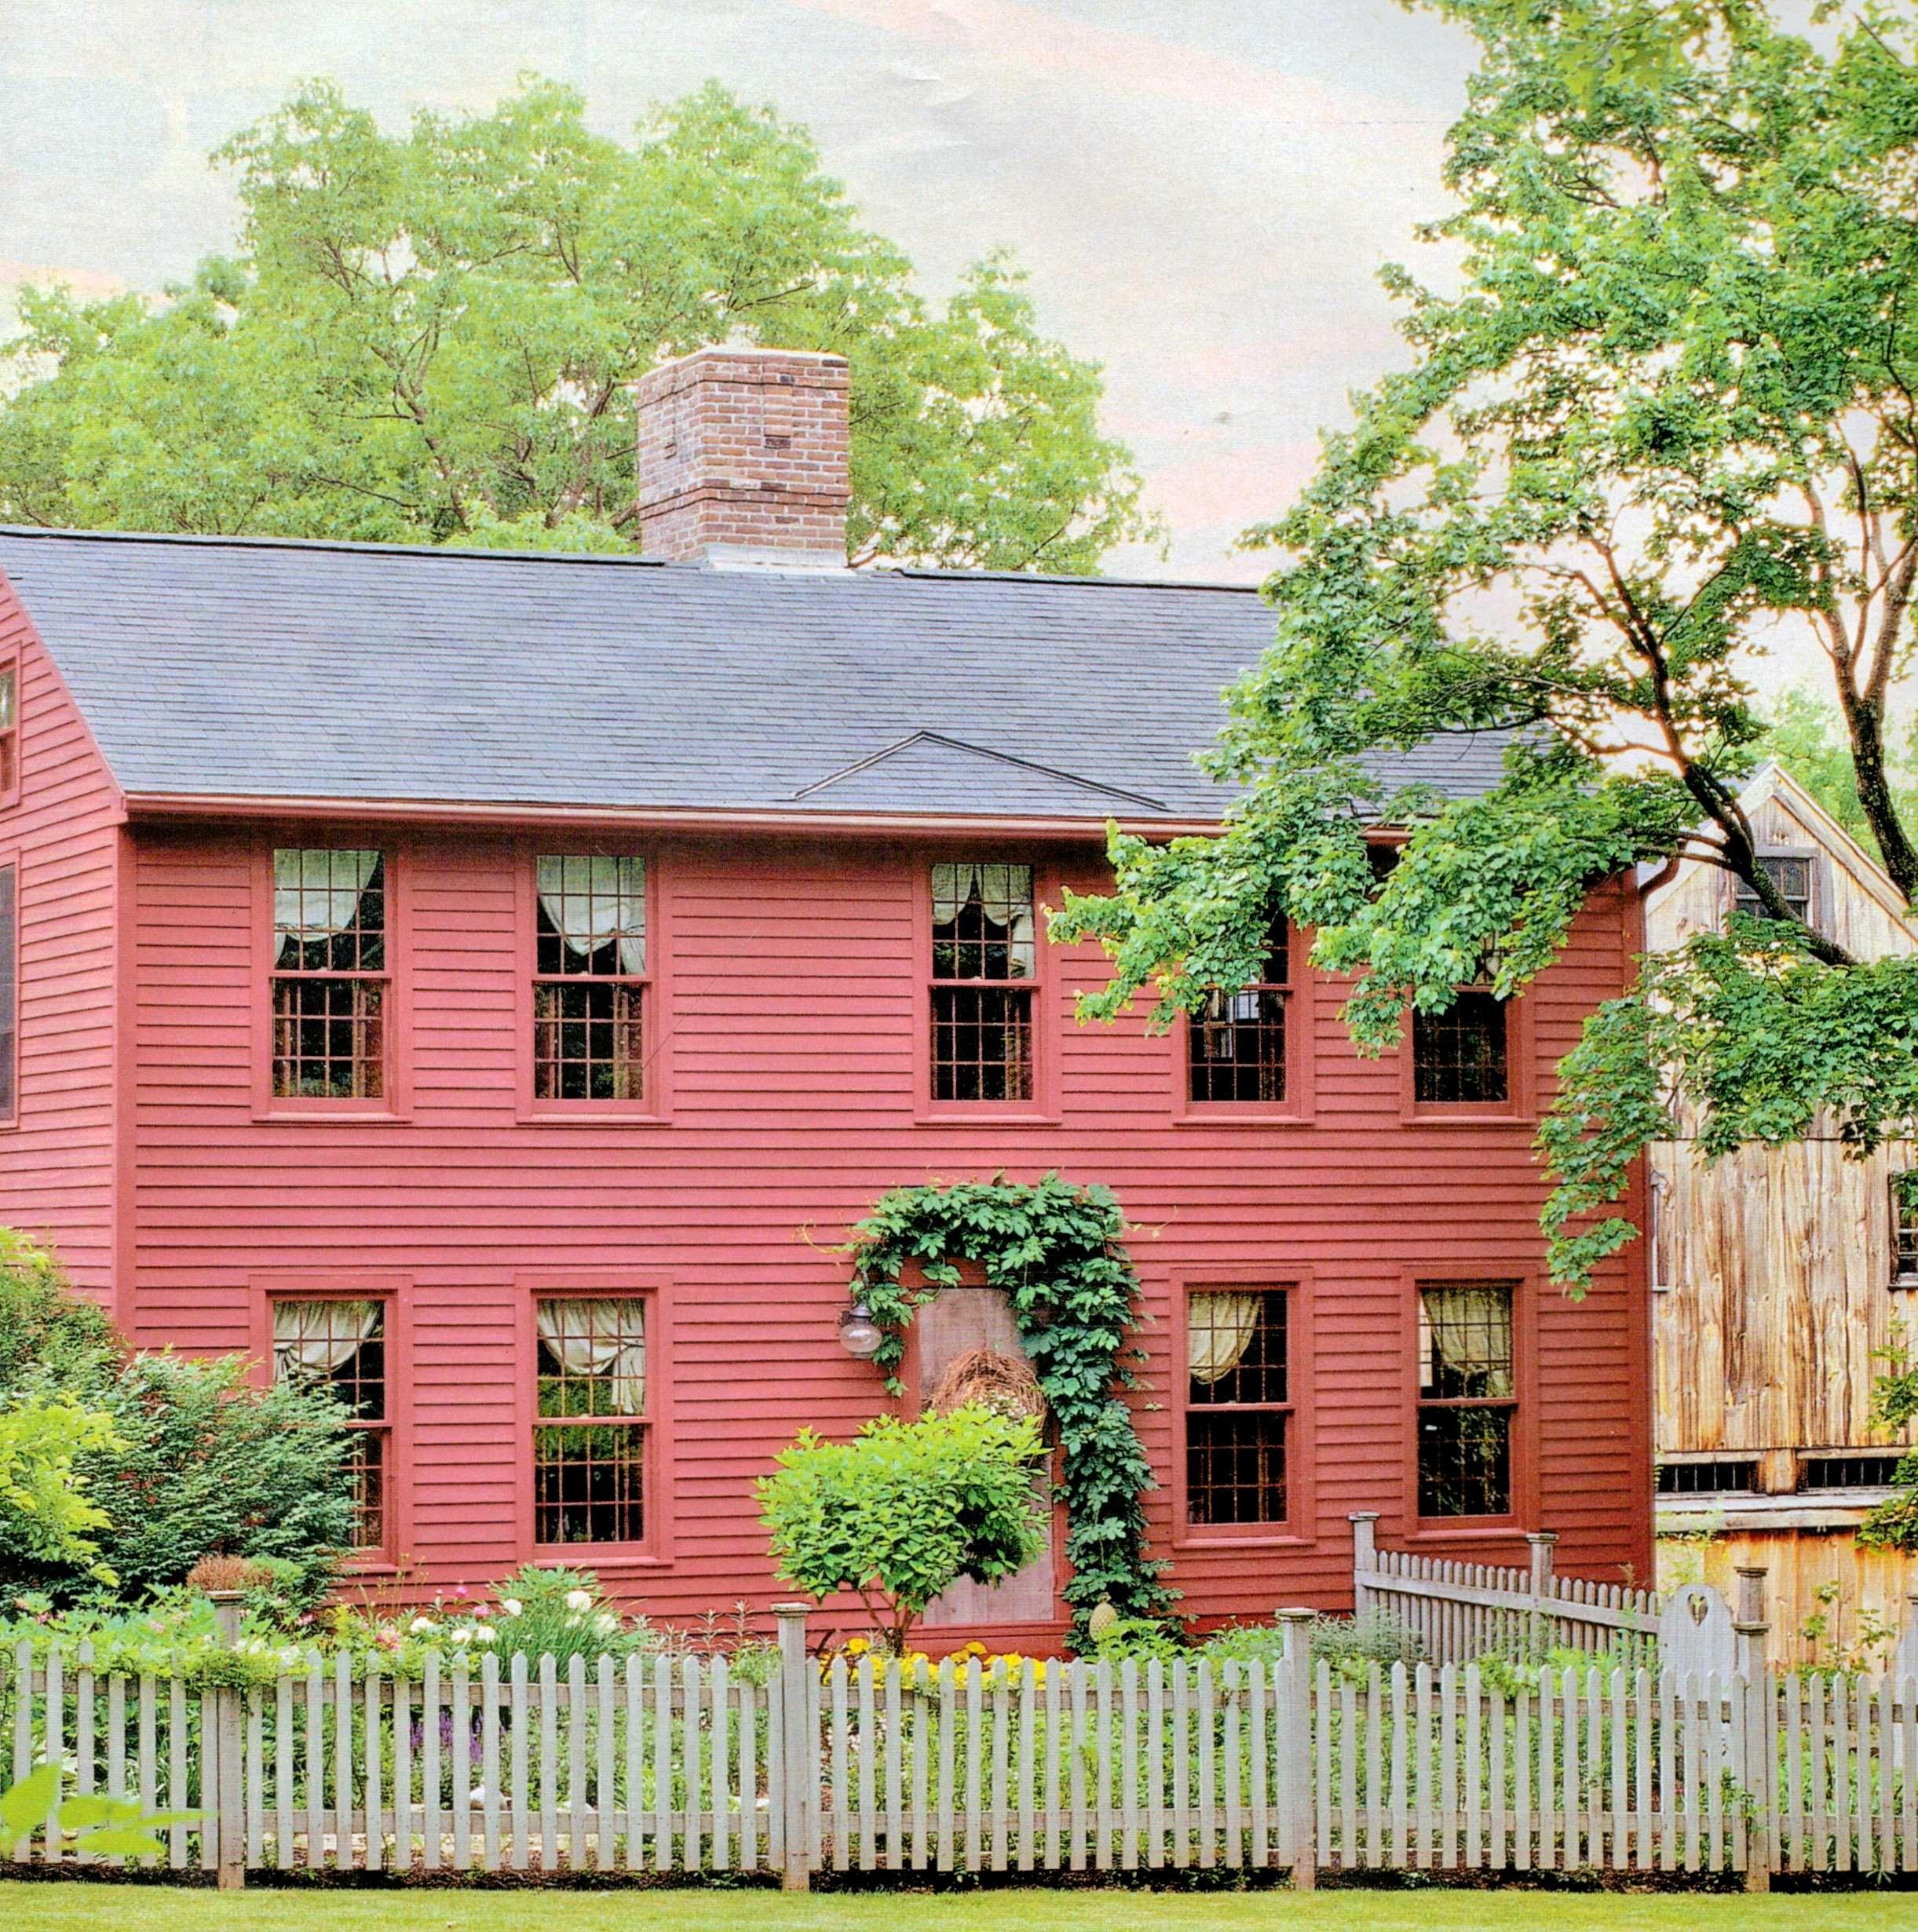 mckie wing roth jr home designs house design plans